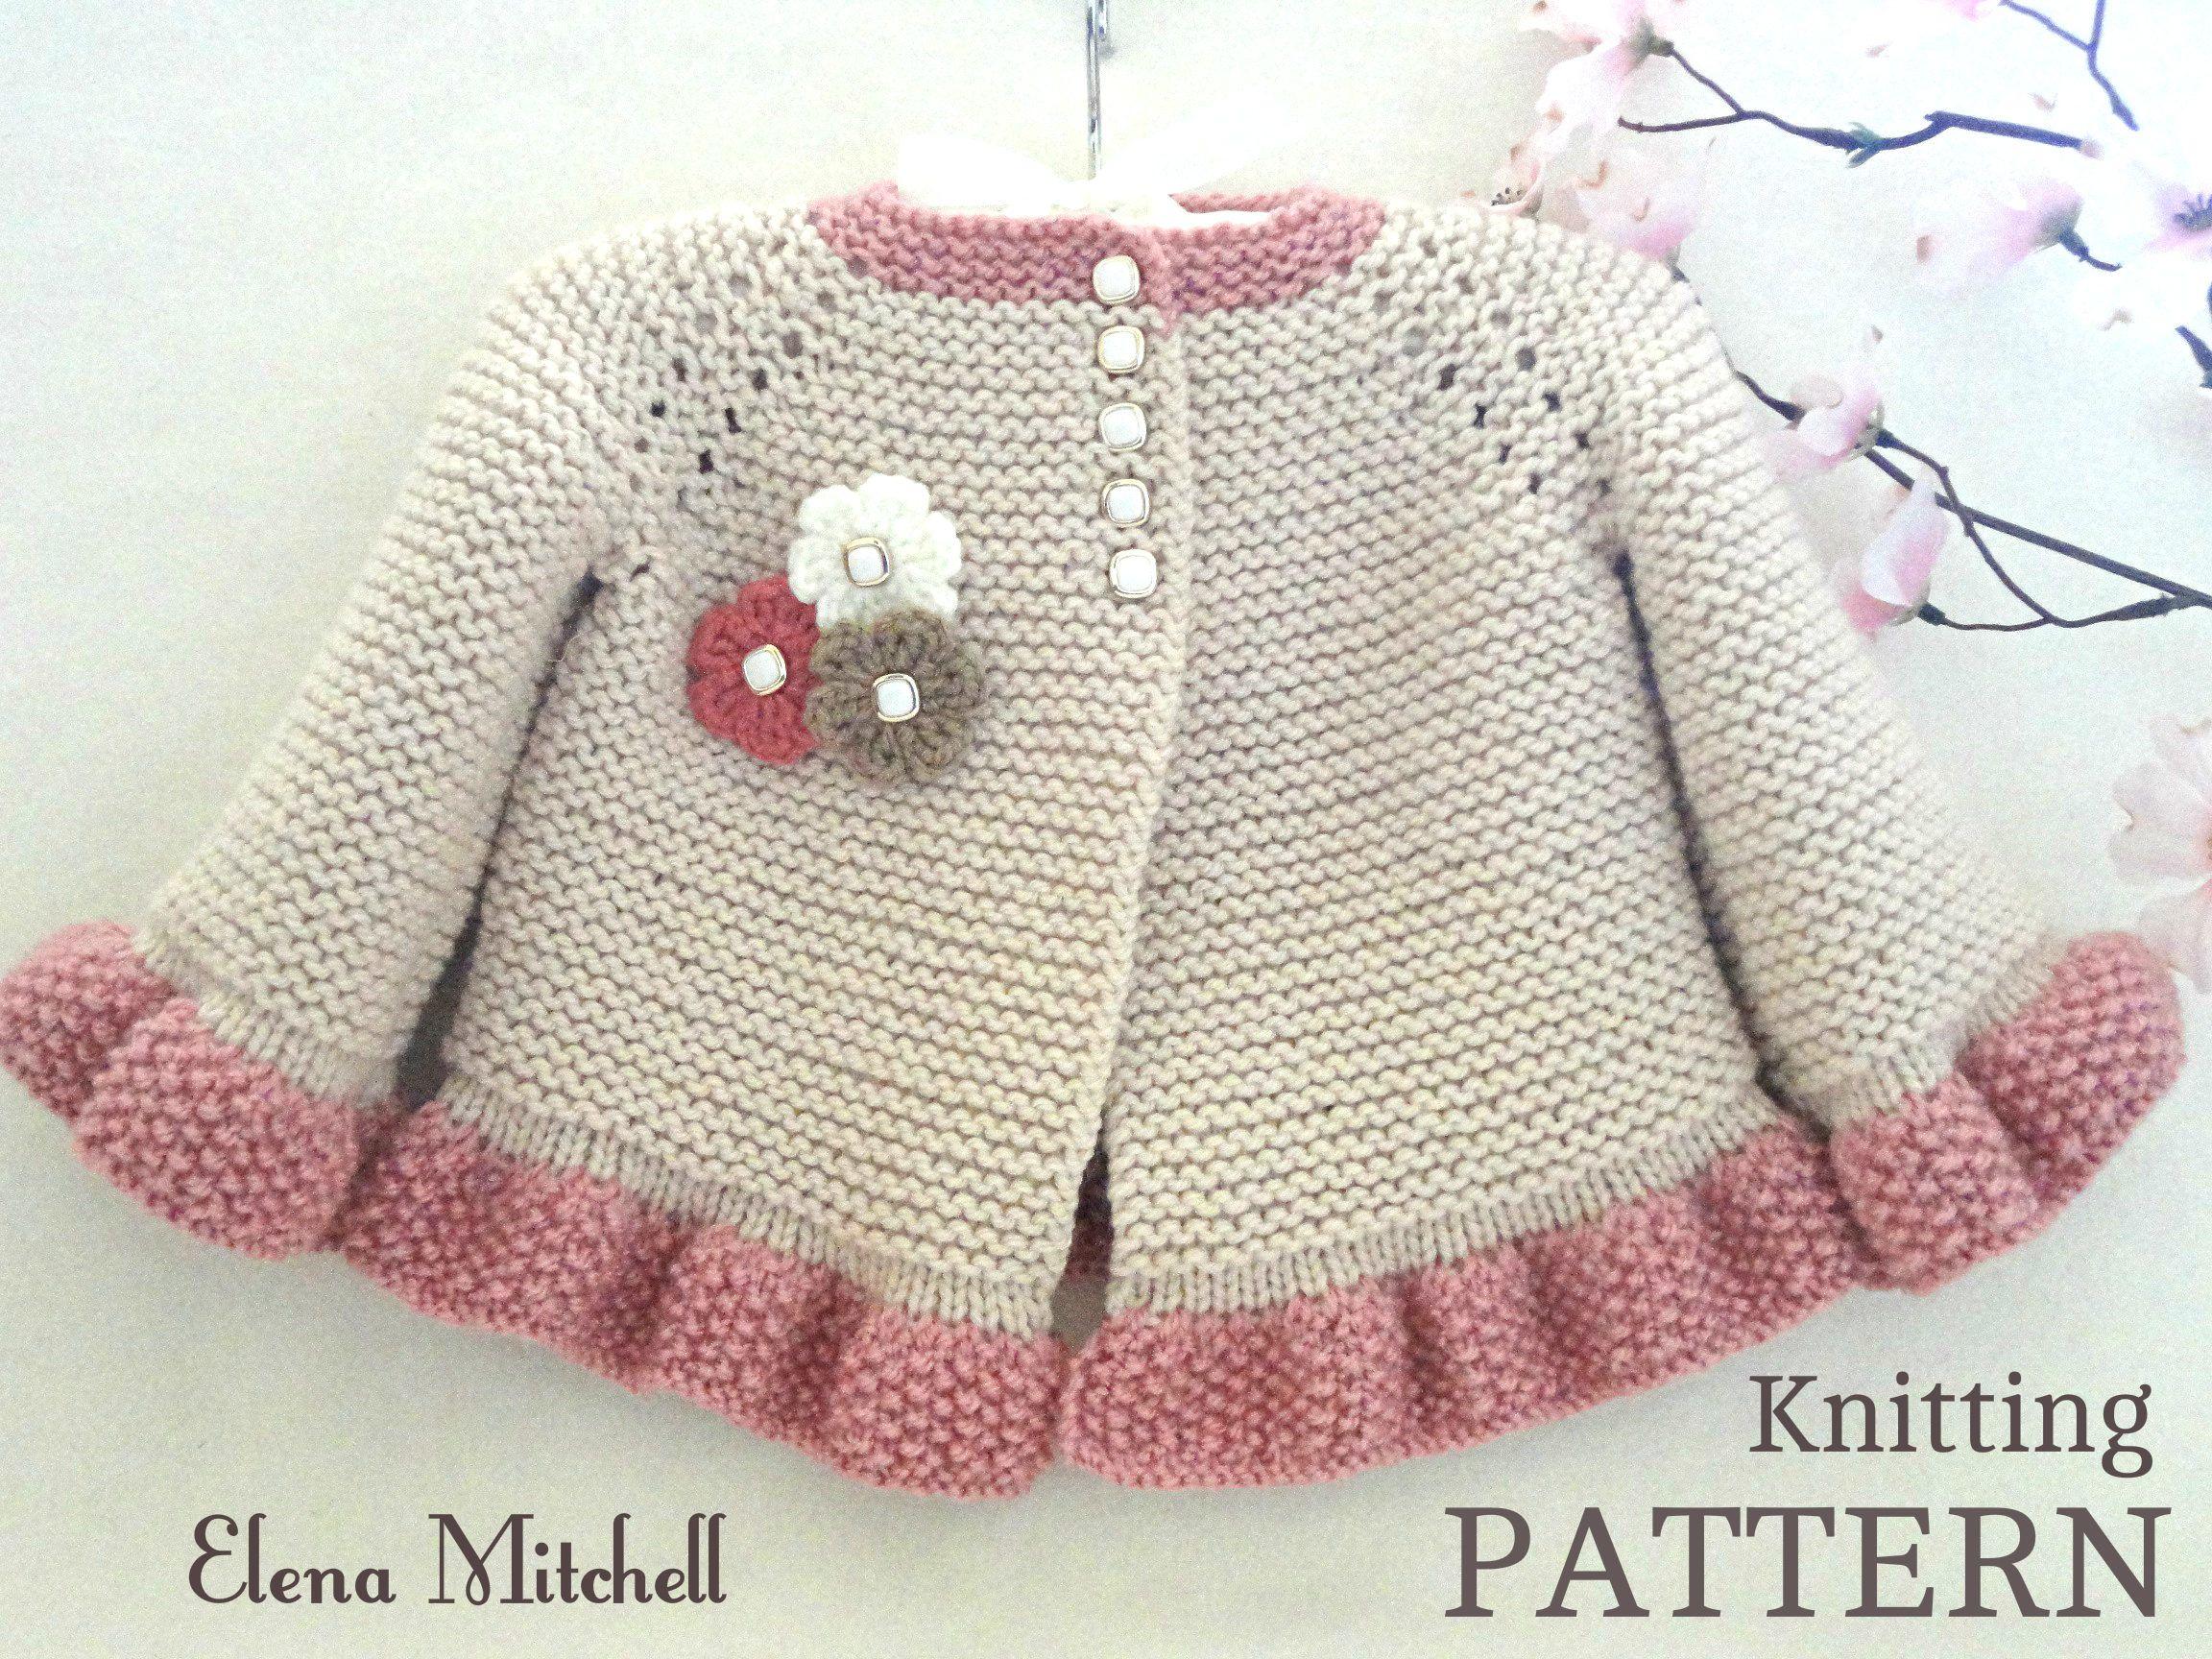 Knitting pattern baby jacket baby cardigan garter stitch knit knitting pattern baby jacket baby cardigan garter stitch knit bankloansurffo Images